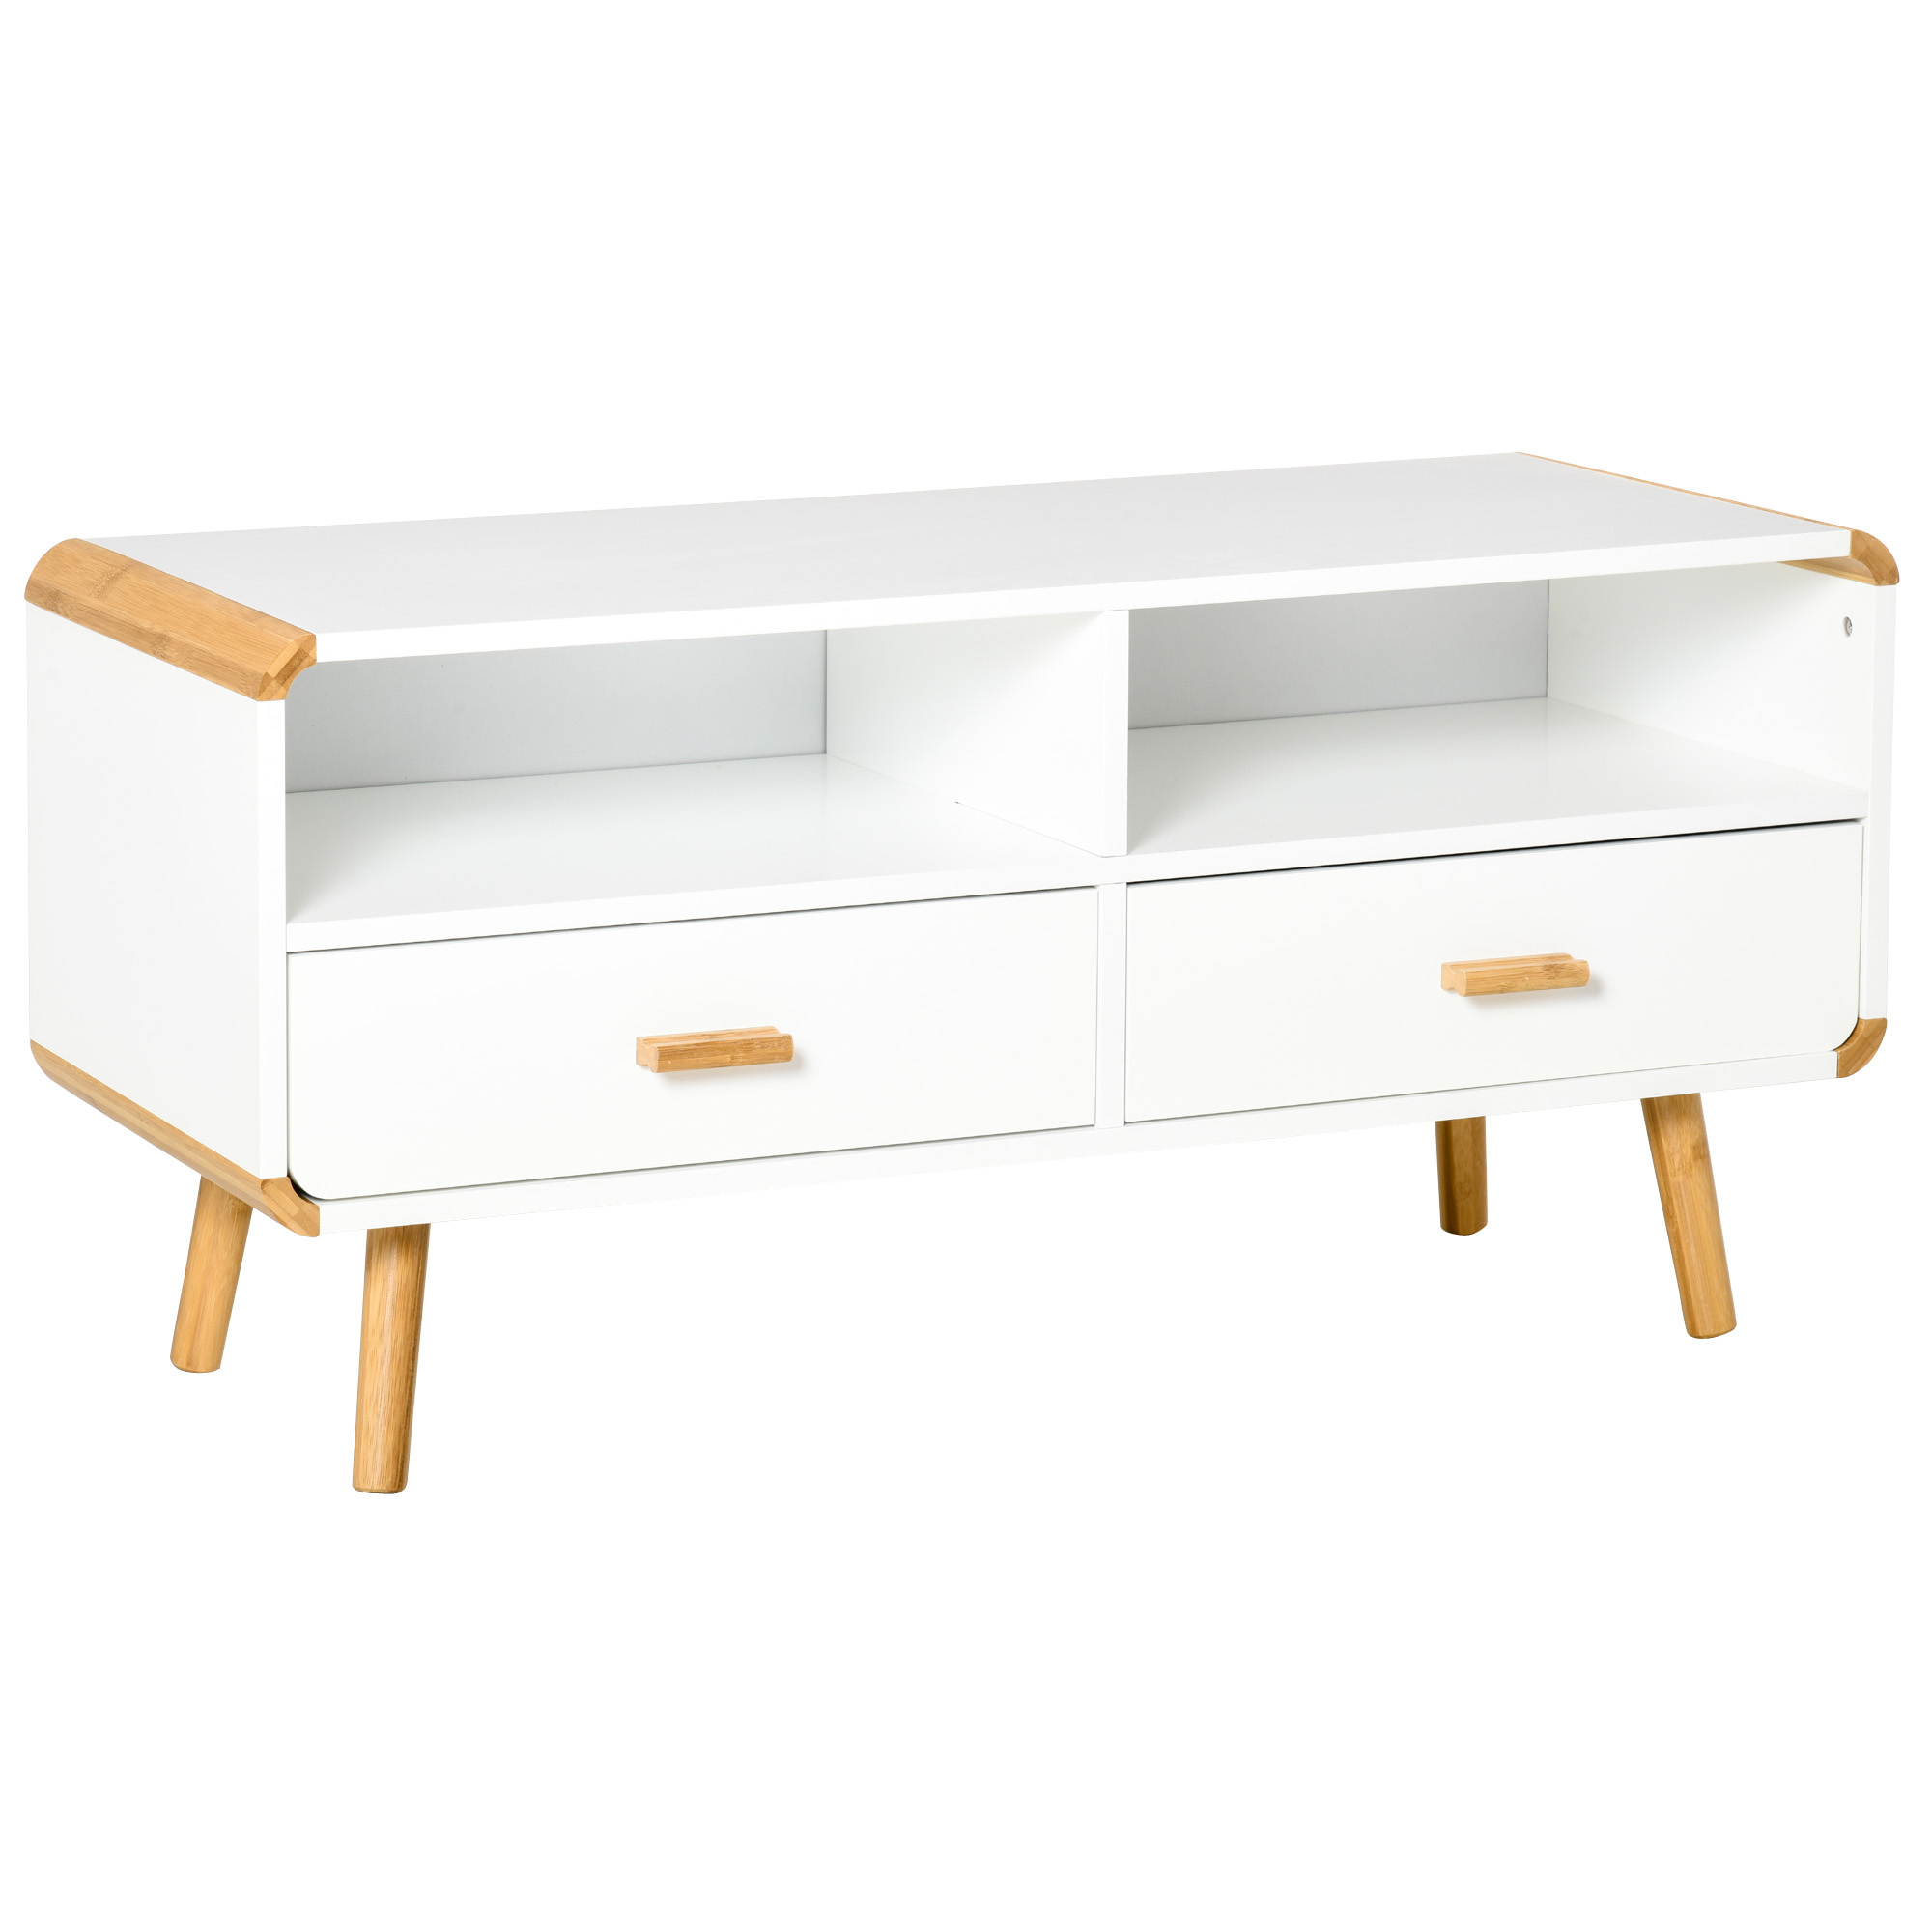 Meuble TV bas sur pieds style scandinave 2 niches 2 tiroirs MDF blanc bois massif bambou